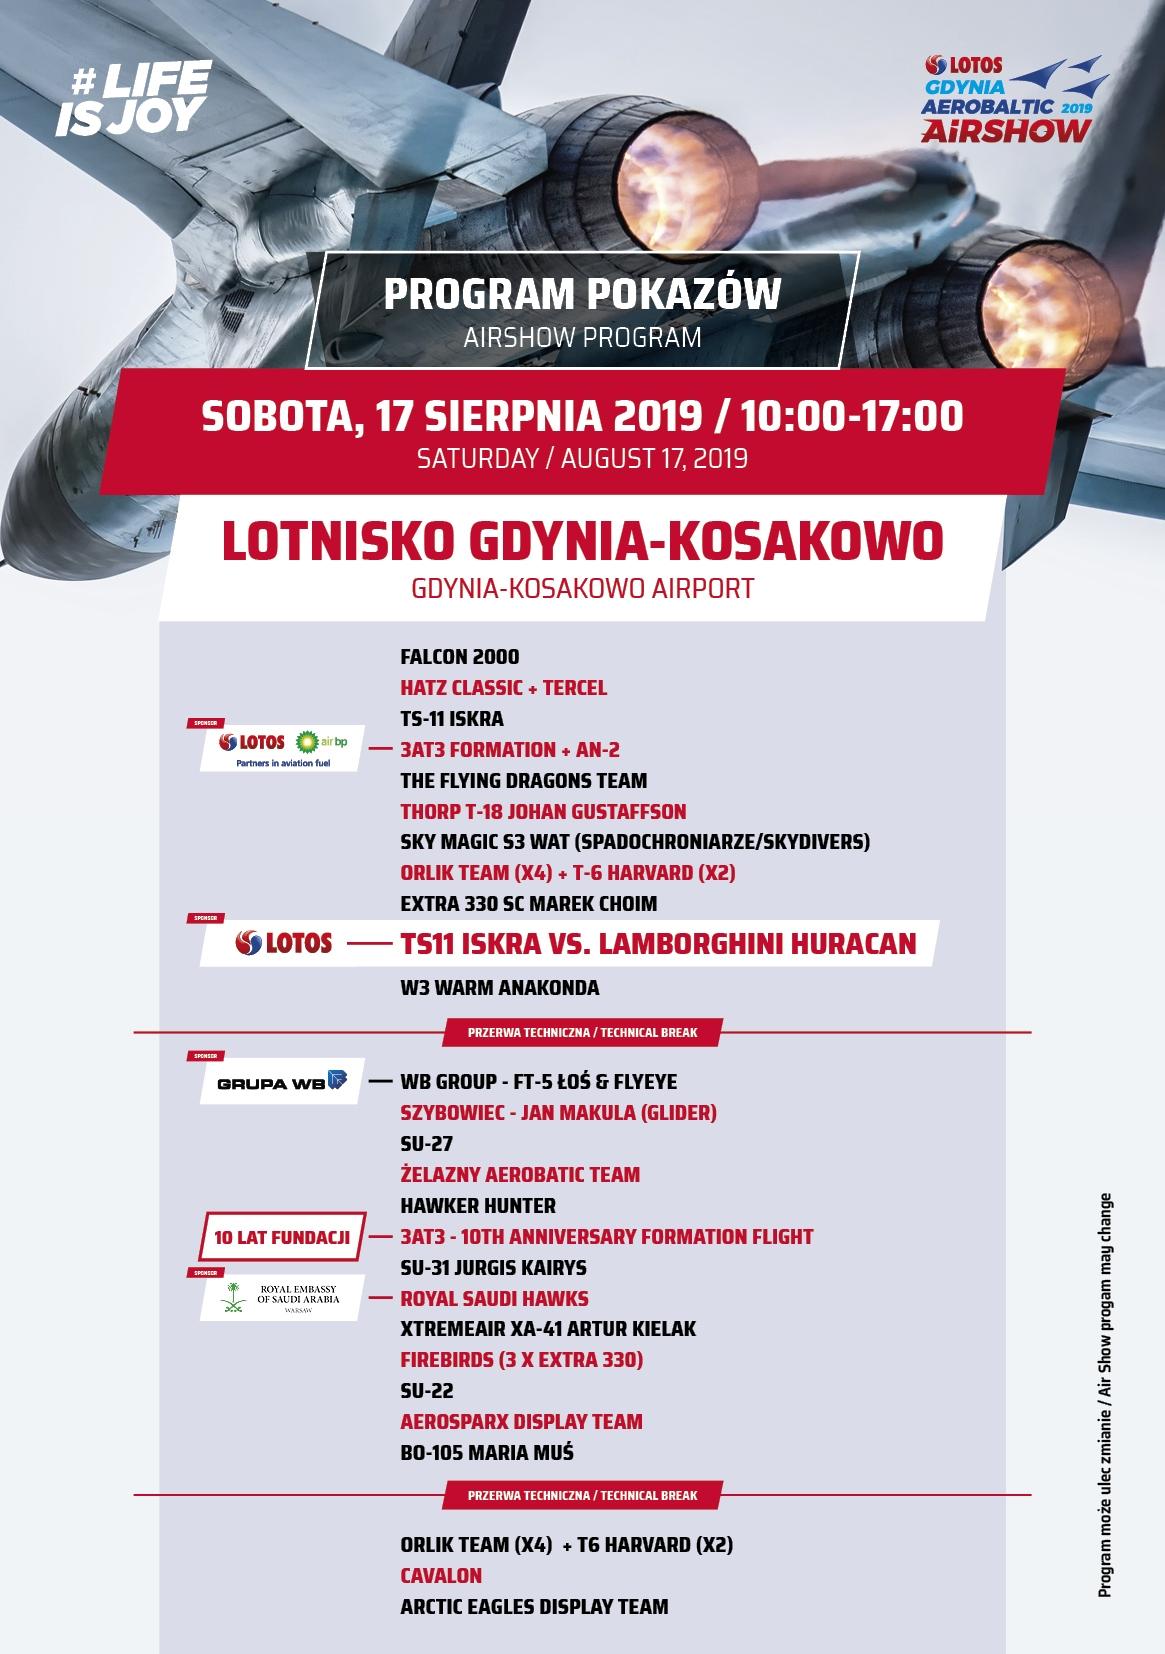 LOTOS Gdynia Aerobaltic 17.08.2019 - 18.08.2019